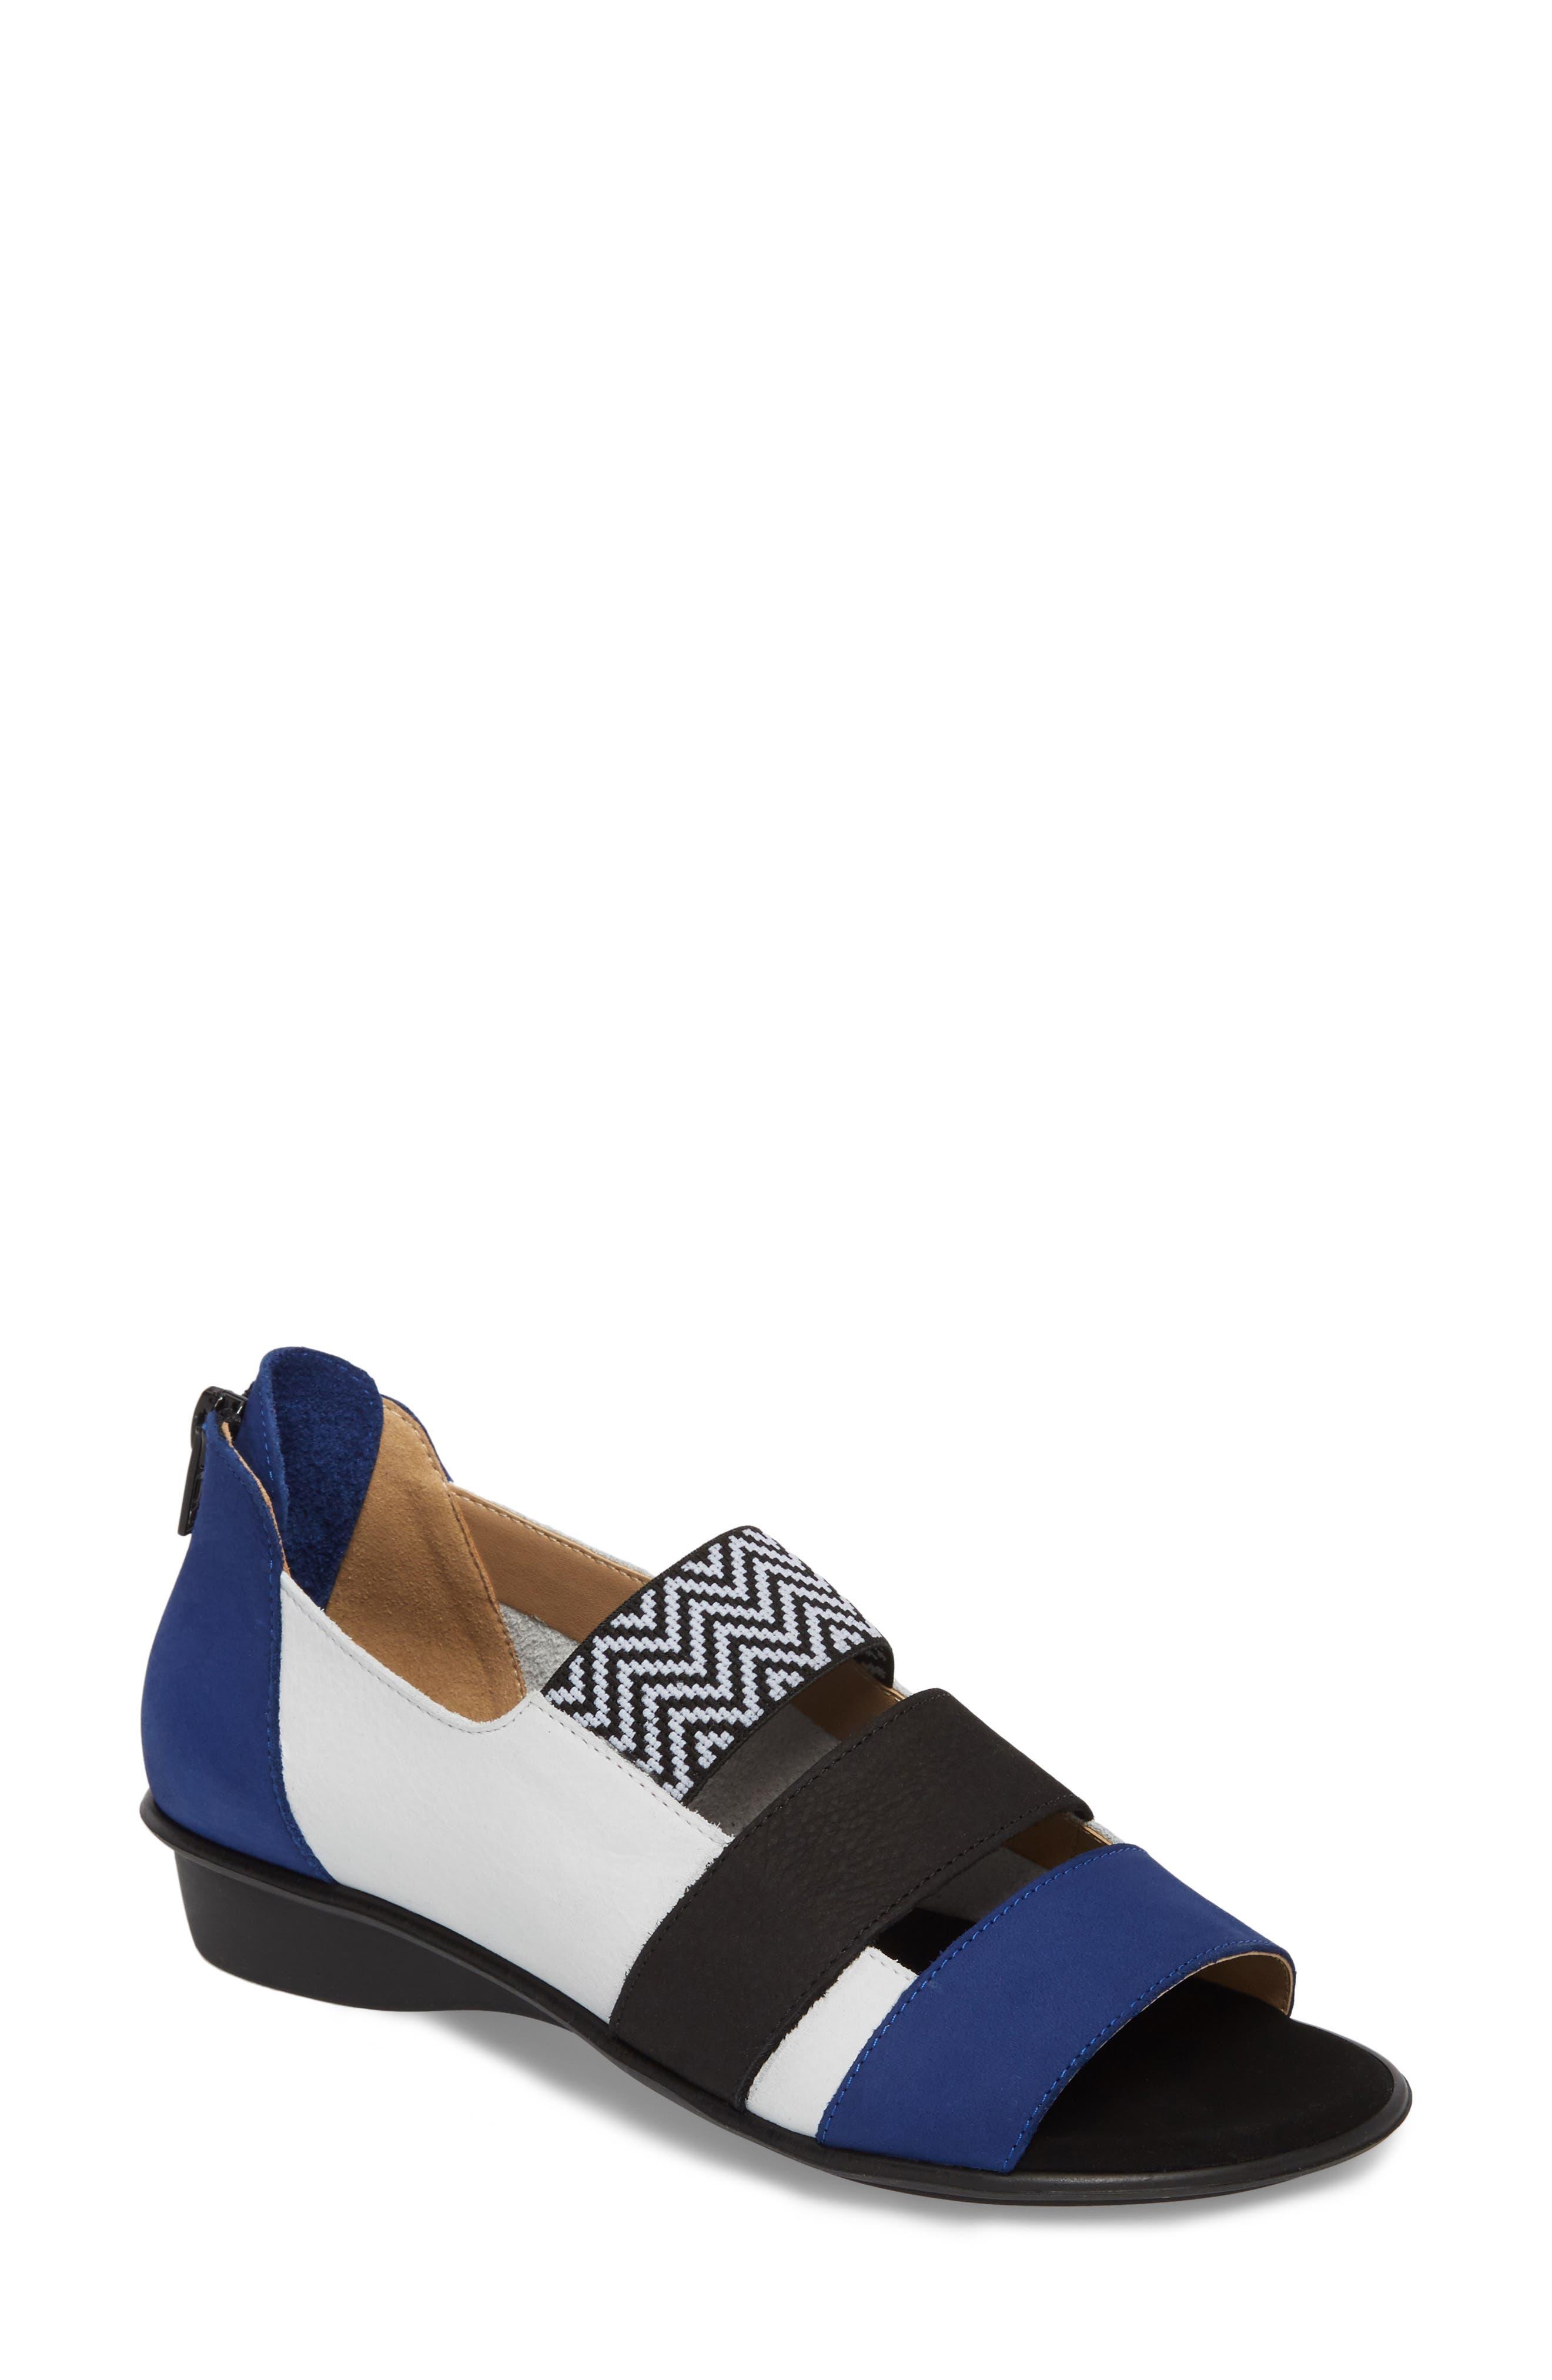 Elise Peep Toe Sandal,                         Main,                         color, White Soft Nubuck